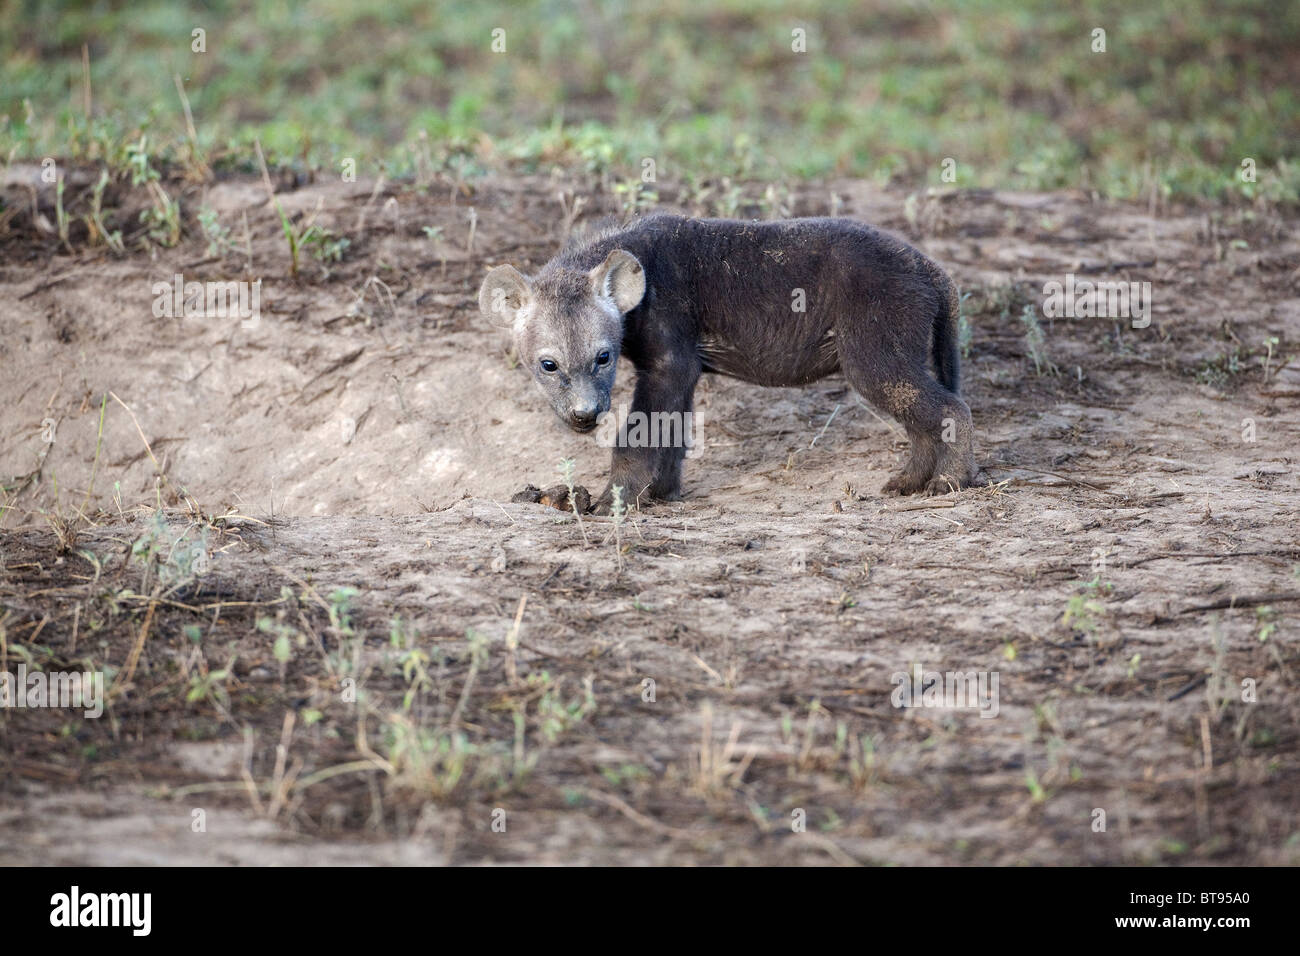 Young spotted Hyena Hyaena cub Crocuta crocuta alone but close to parents in Ndutu clan Tanzania - Stock Image